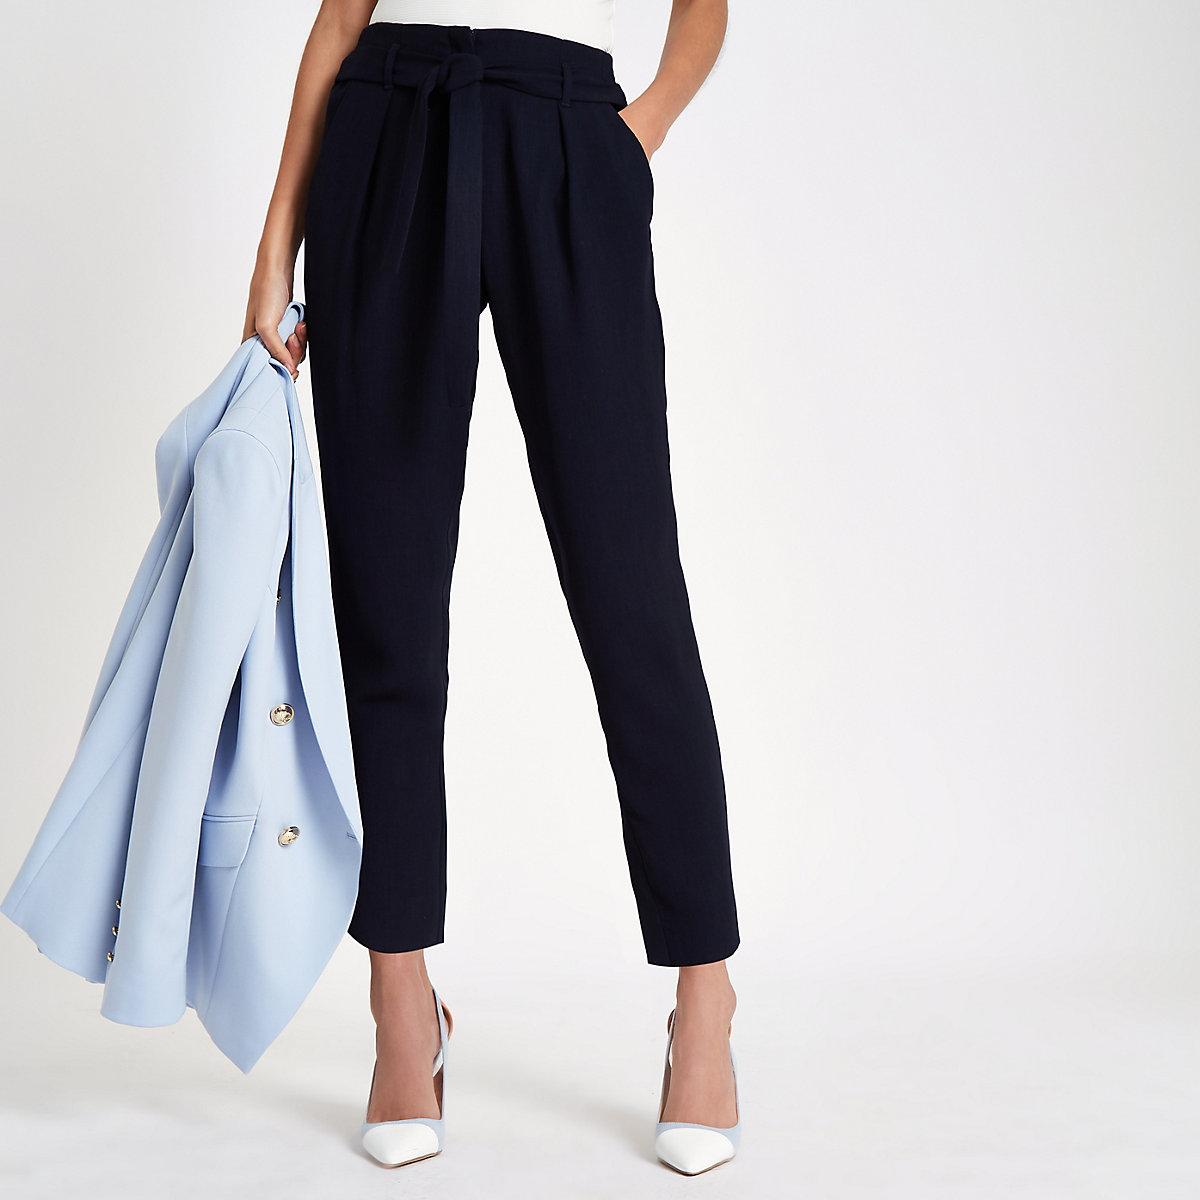 Navy tie waist tapered pants